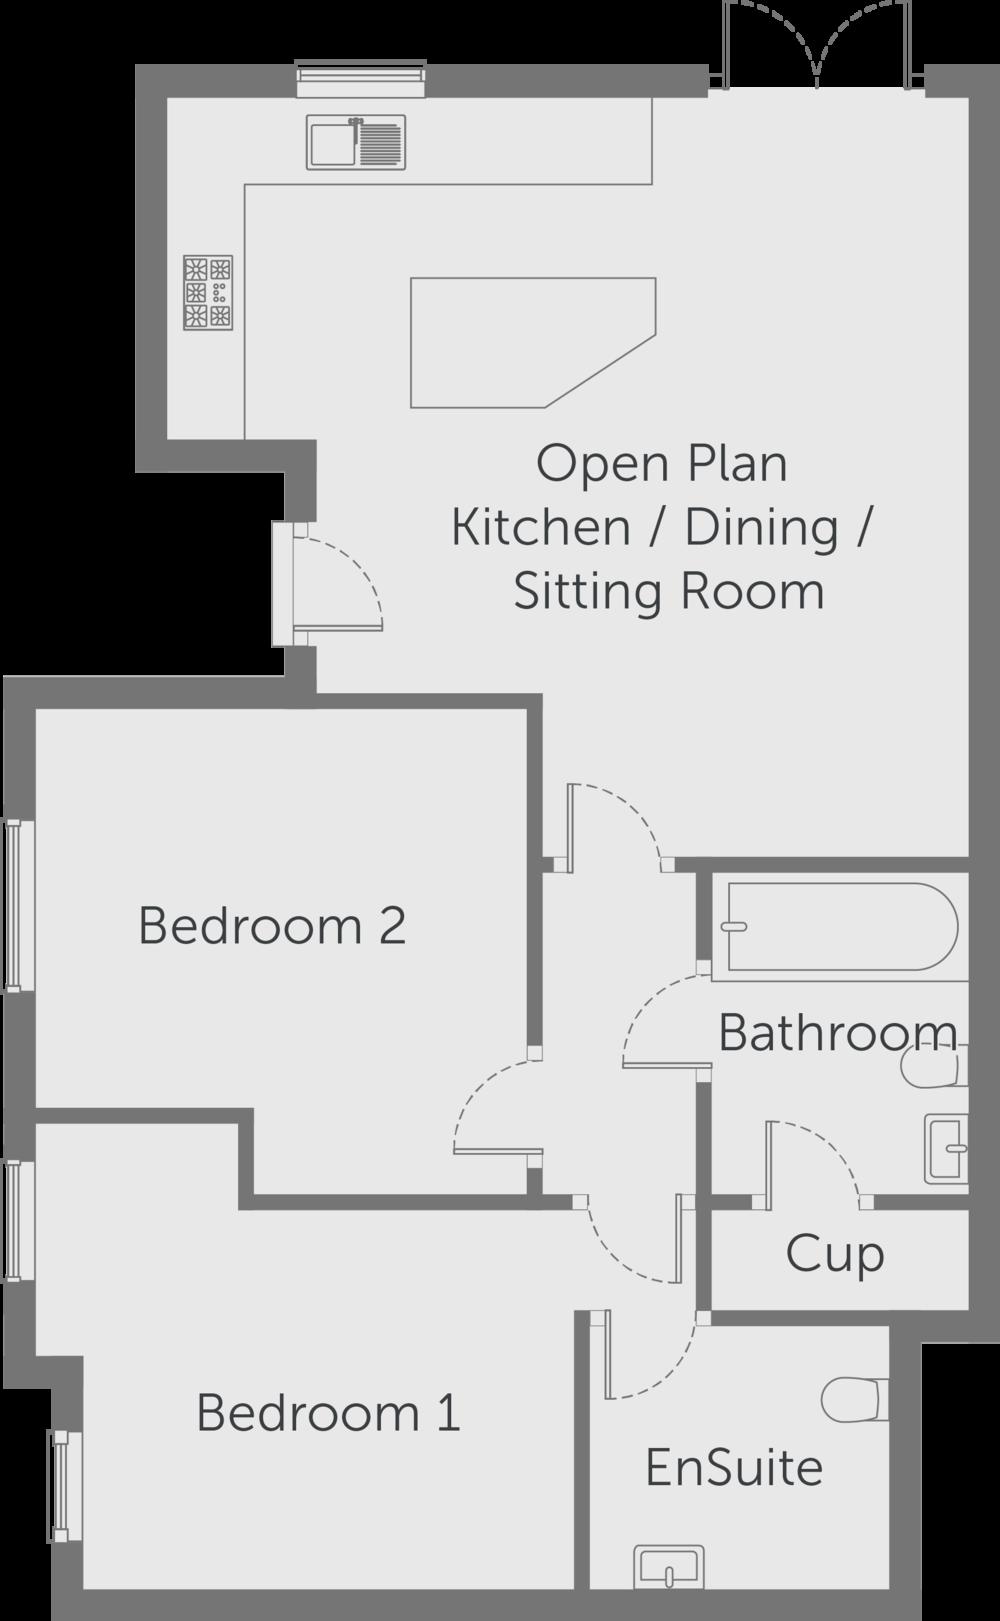 1 New Barn, floorplan_02.png